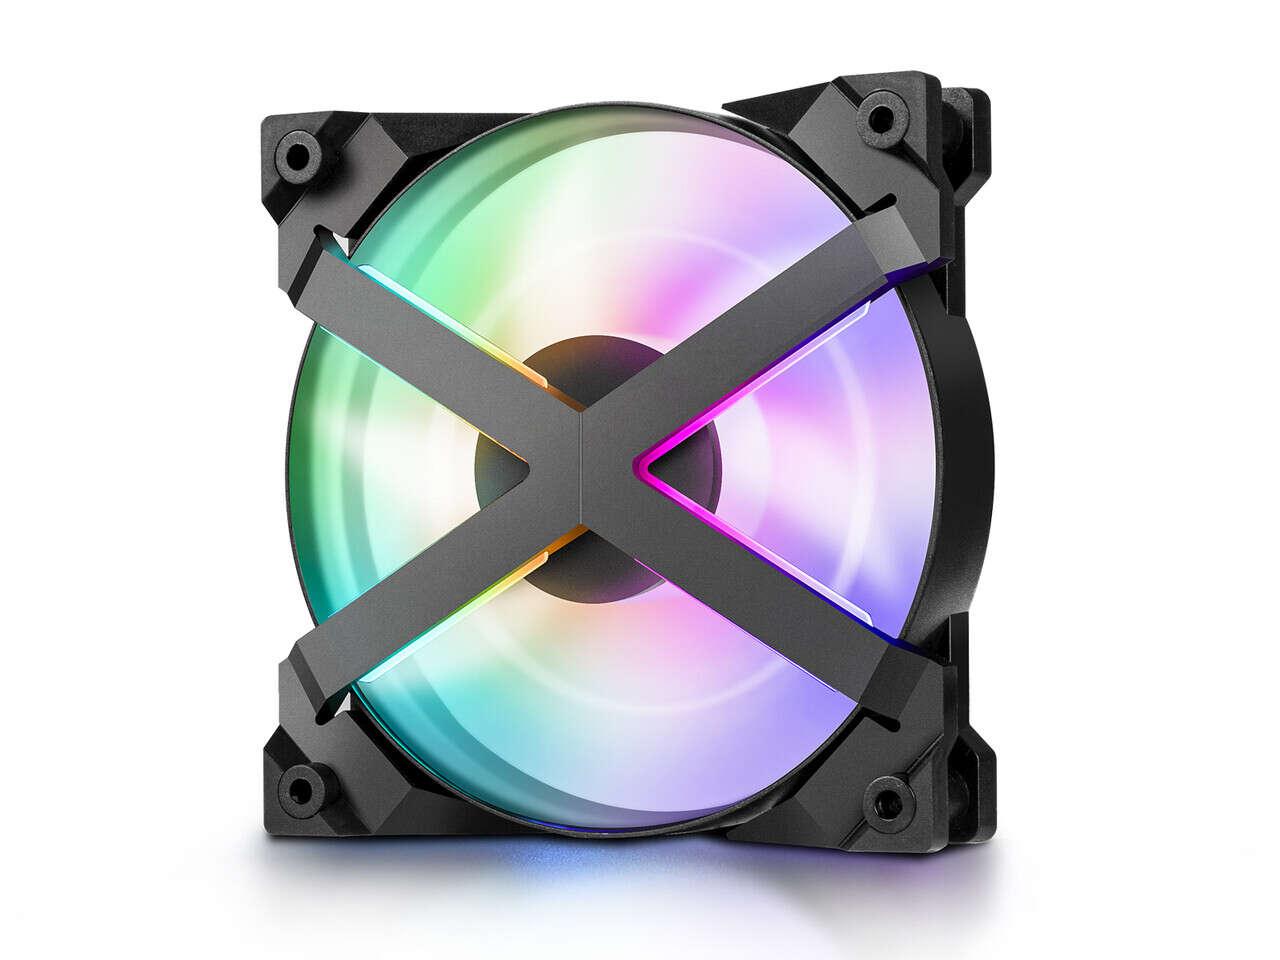 wentylatory Deepcool MF120 GT A-RGB, cena Deepcool MF120 GT A-RGB